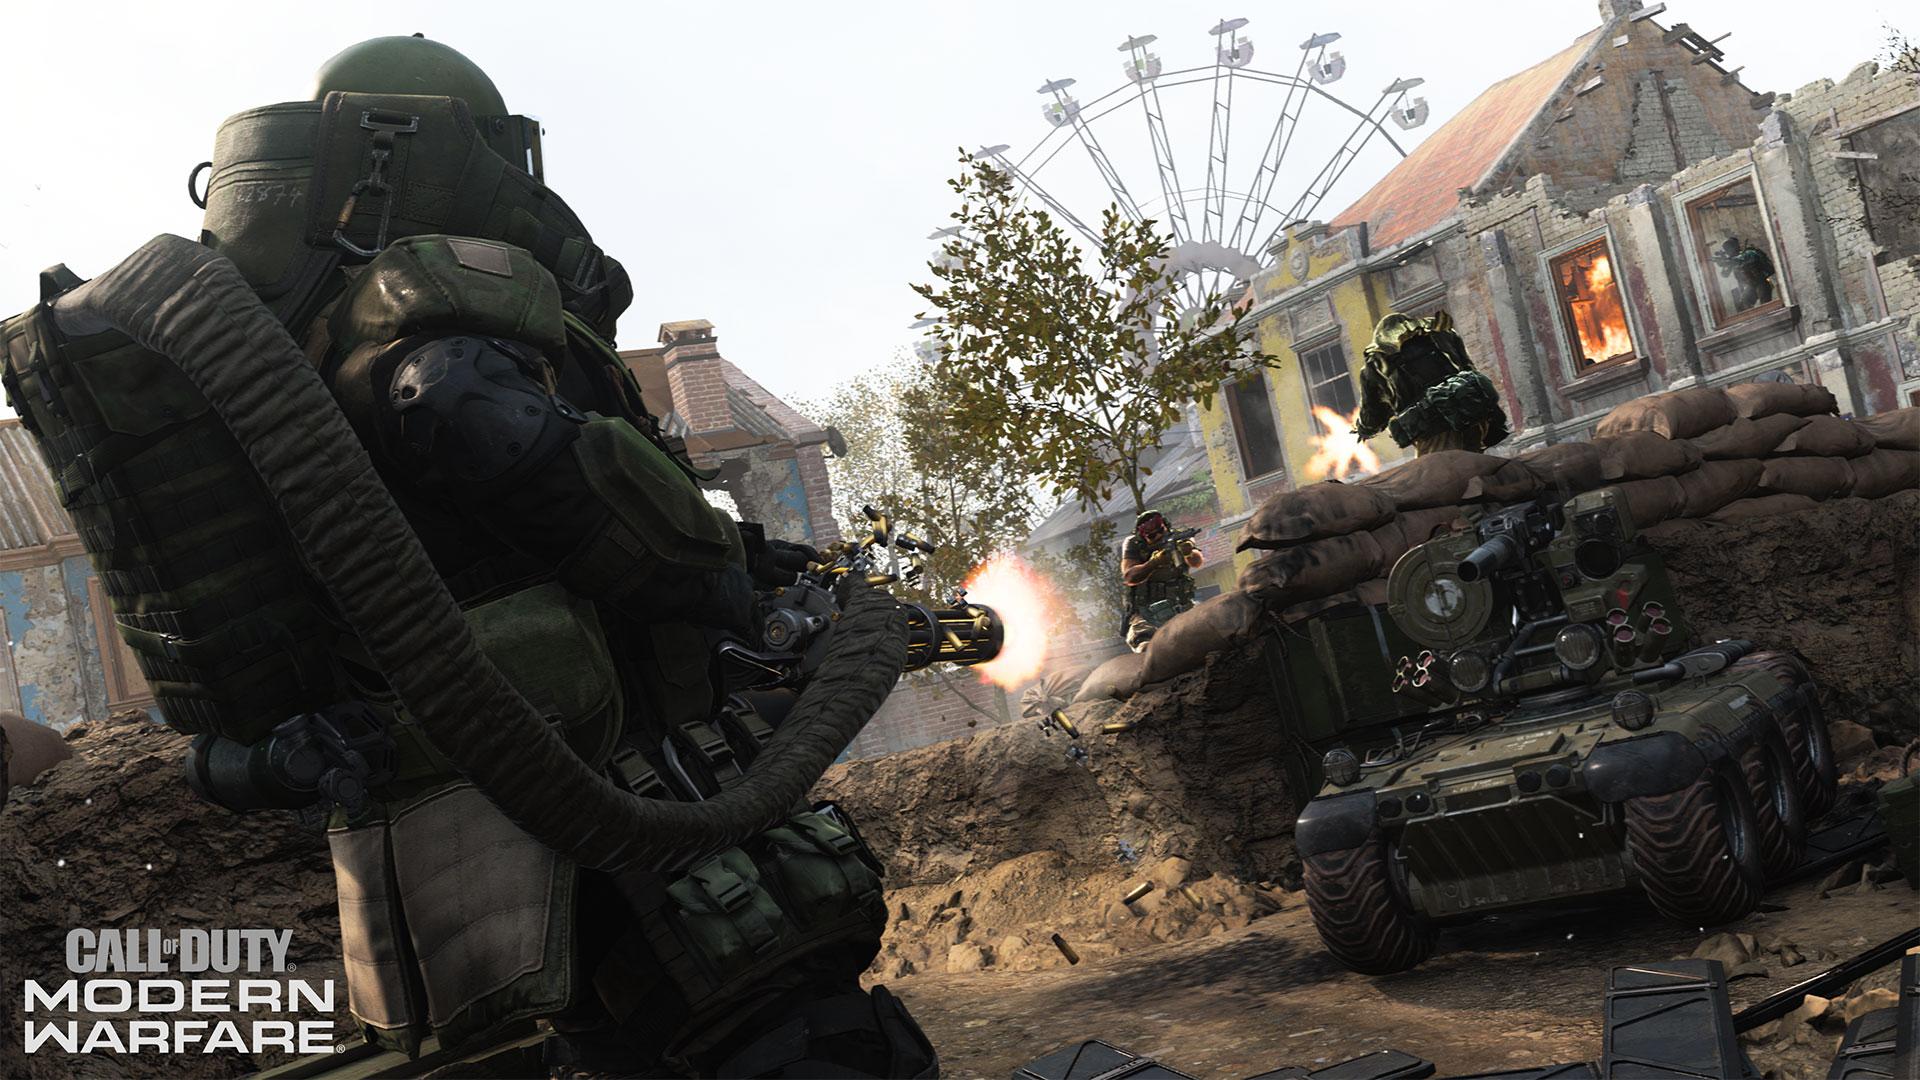 'Call of Duty: Modern Warfare' Beta Introduces Cross-Play Thursday